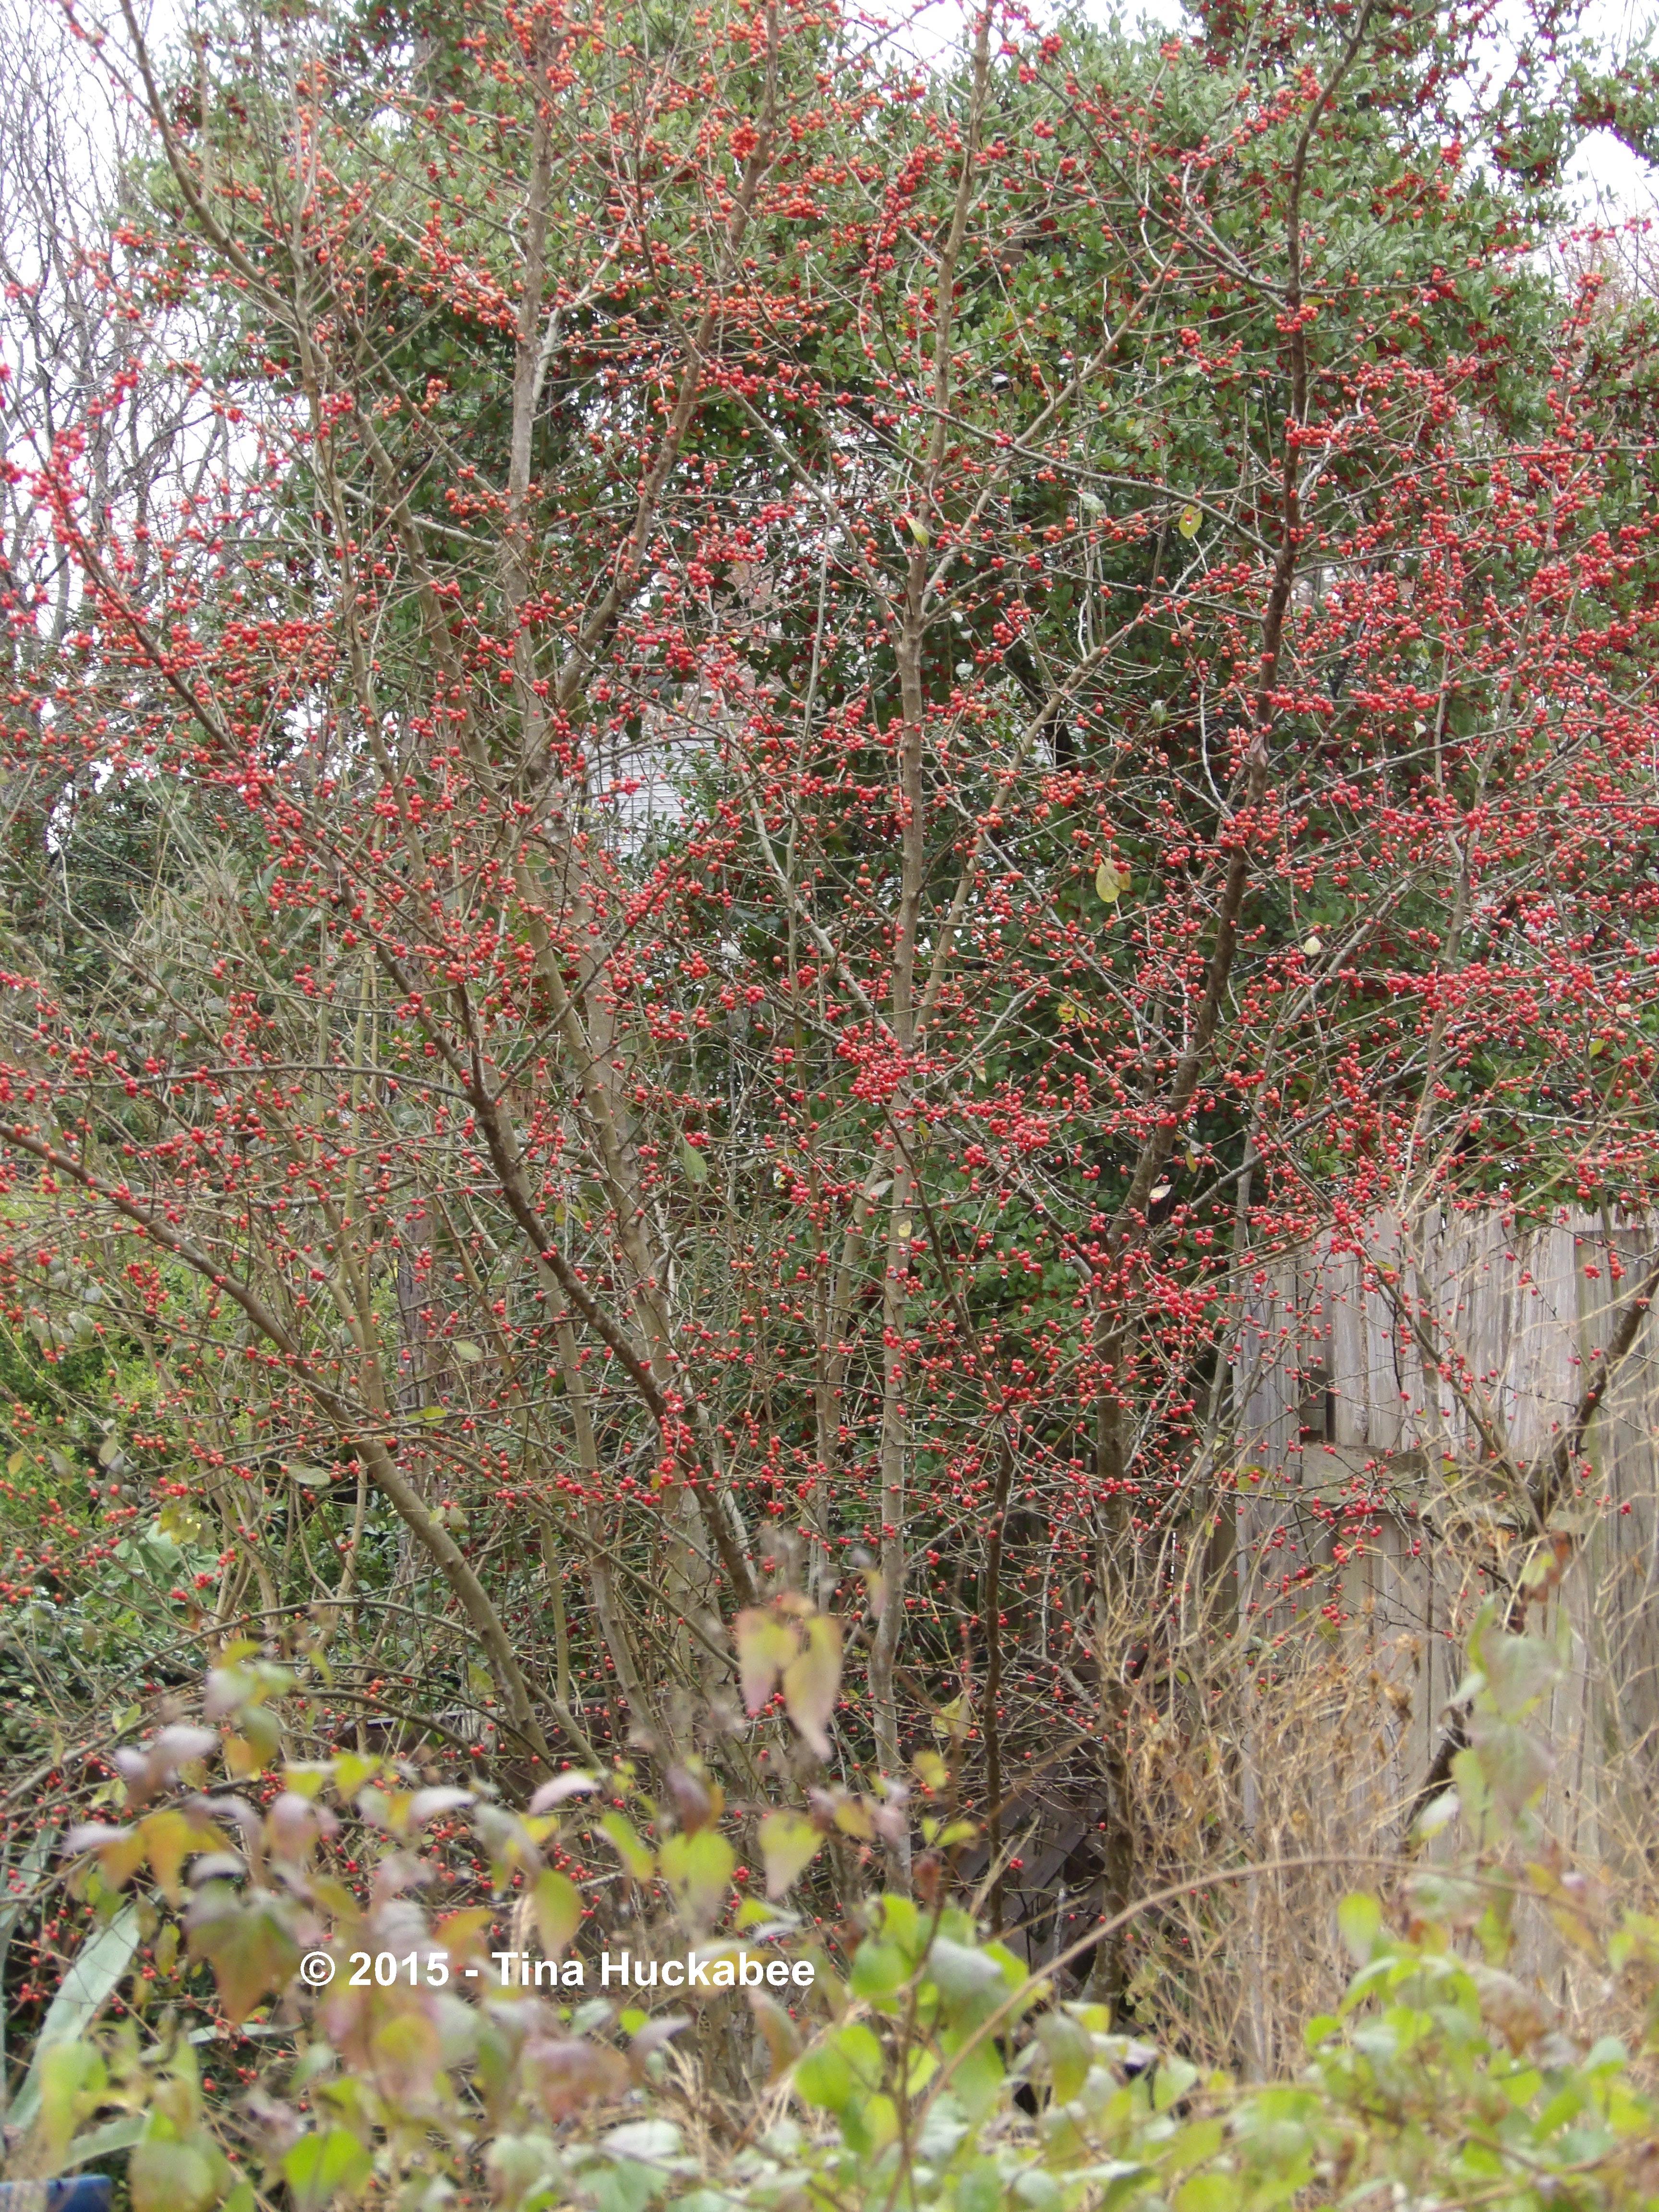 Native Texas Trees | My Gardener Says…